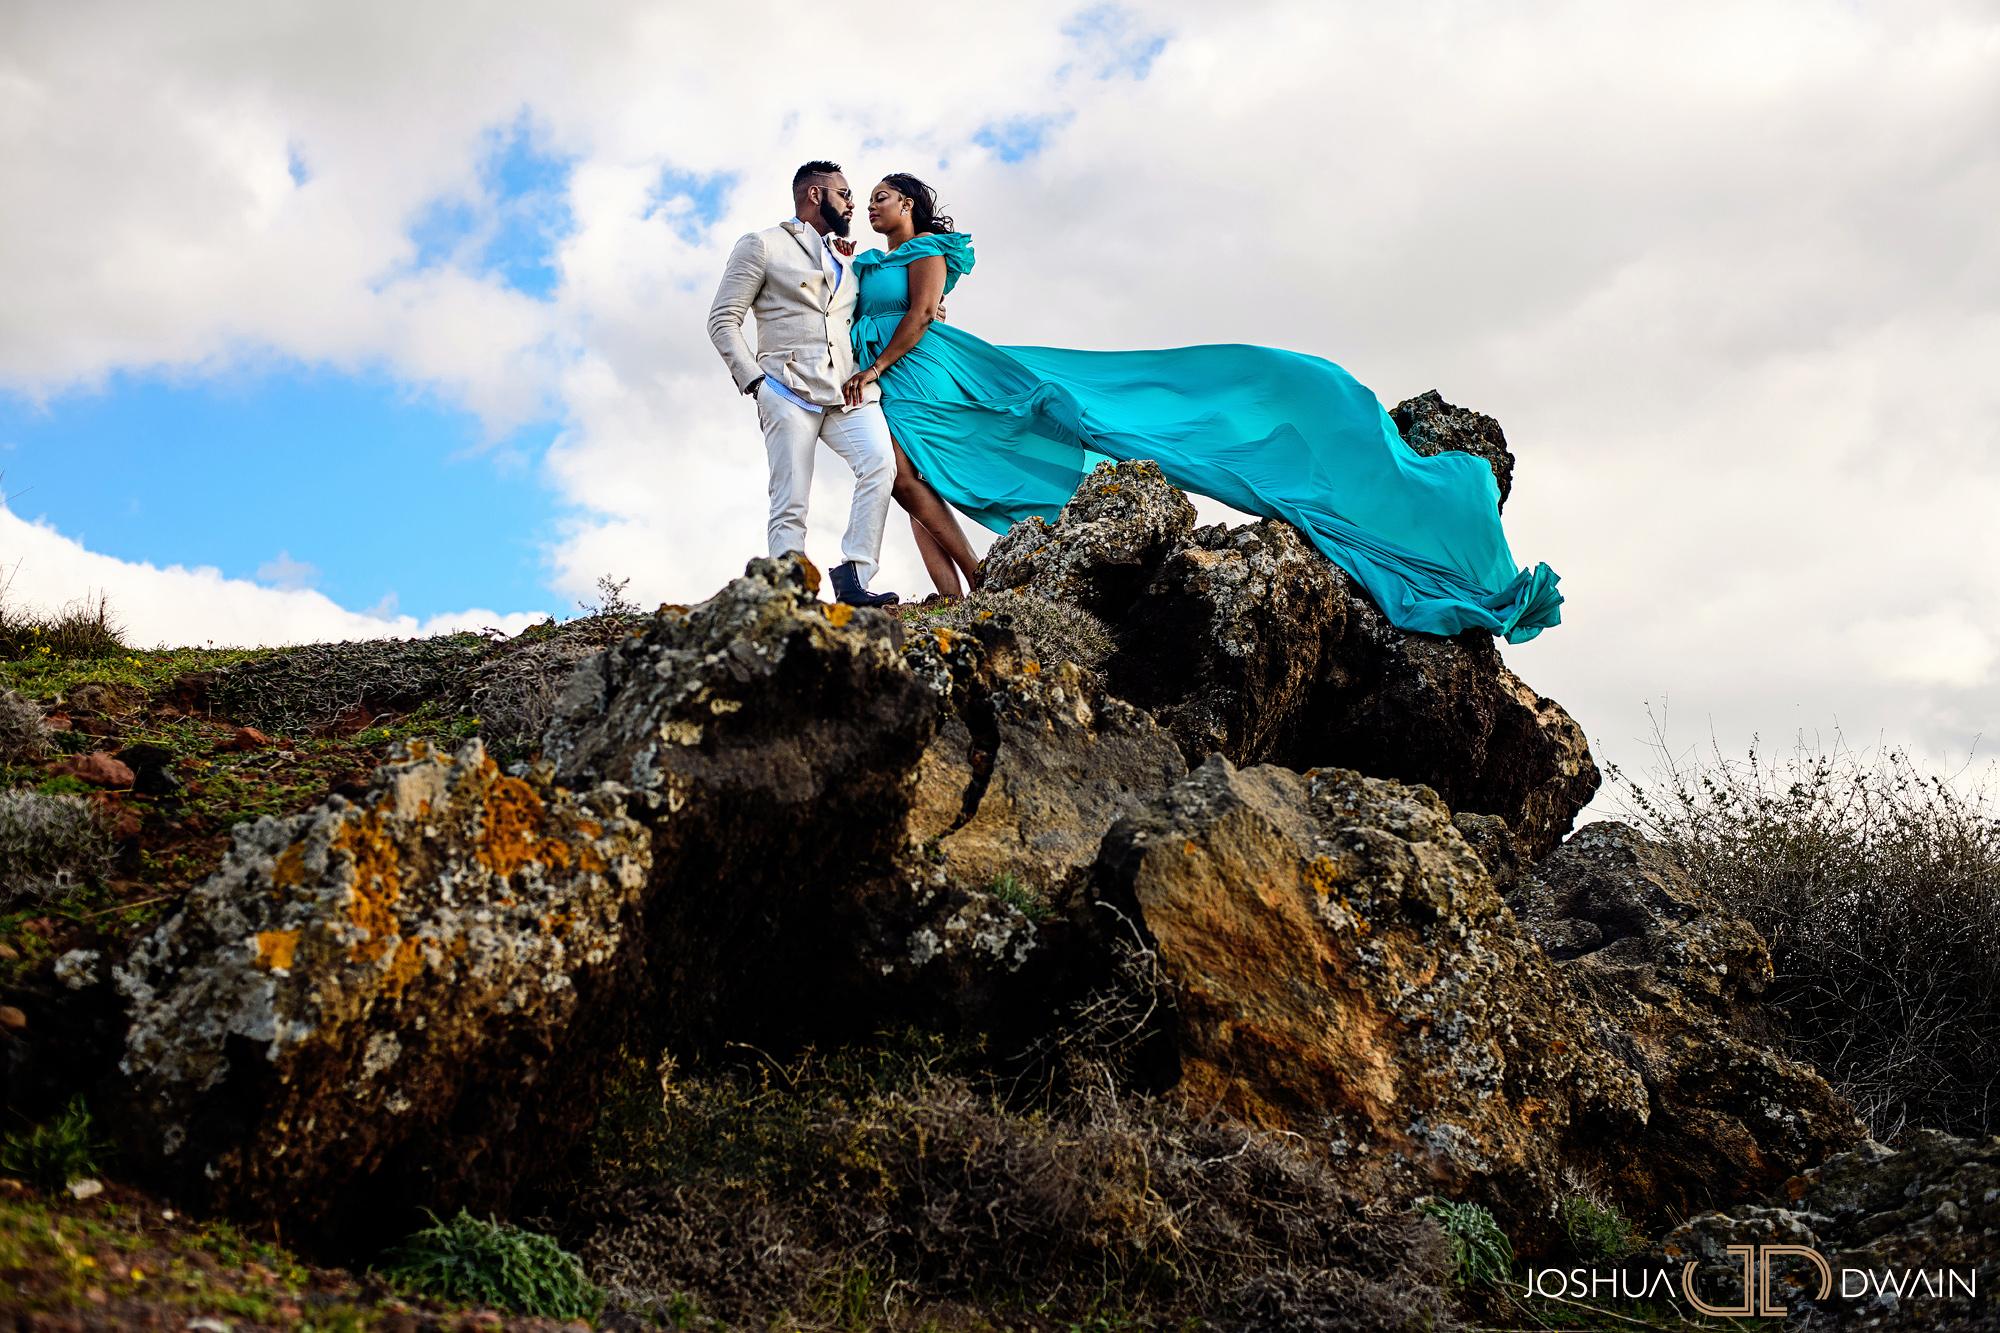 ekene-issac-05-santorini-oia-thira-greece-wedding-engagement-photos-african-american-destination-photographer-joshua-dwain.jpg